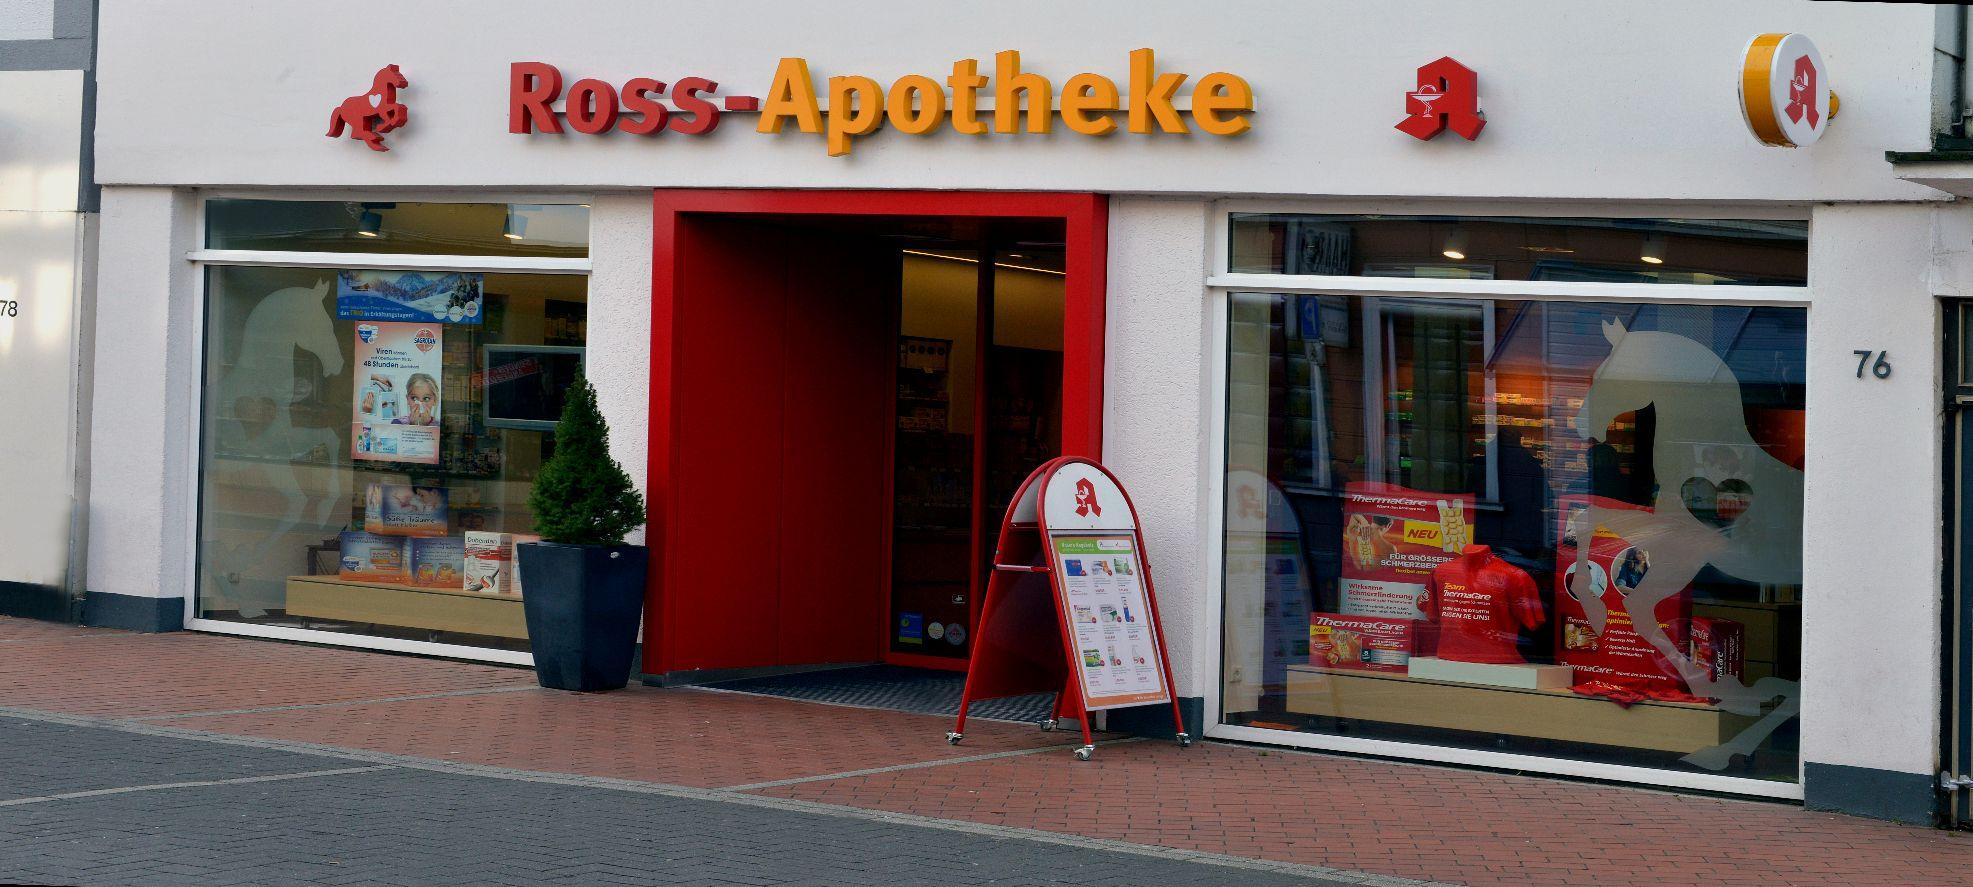 Ross-Apotheke